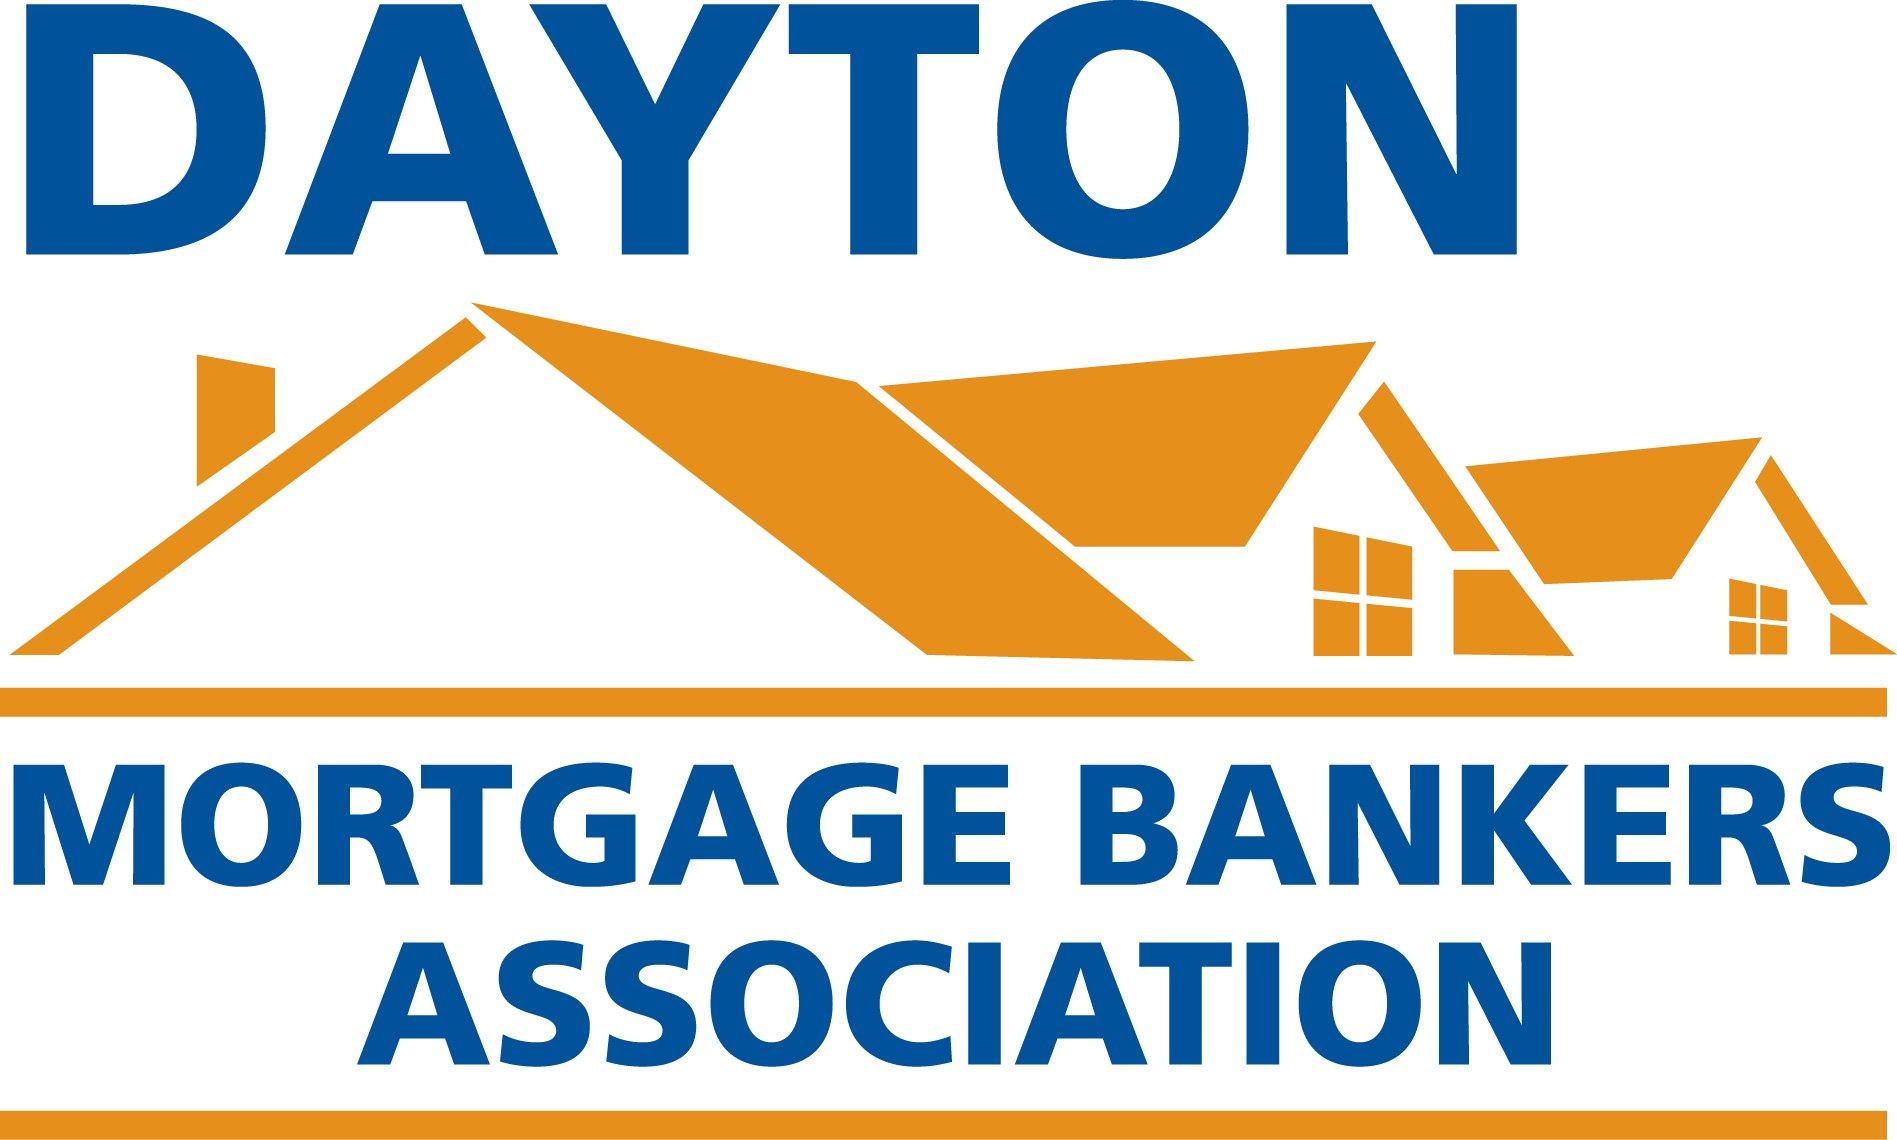 Dayton Mortgage Bankers Association